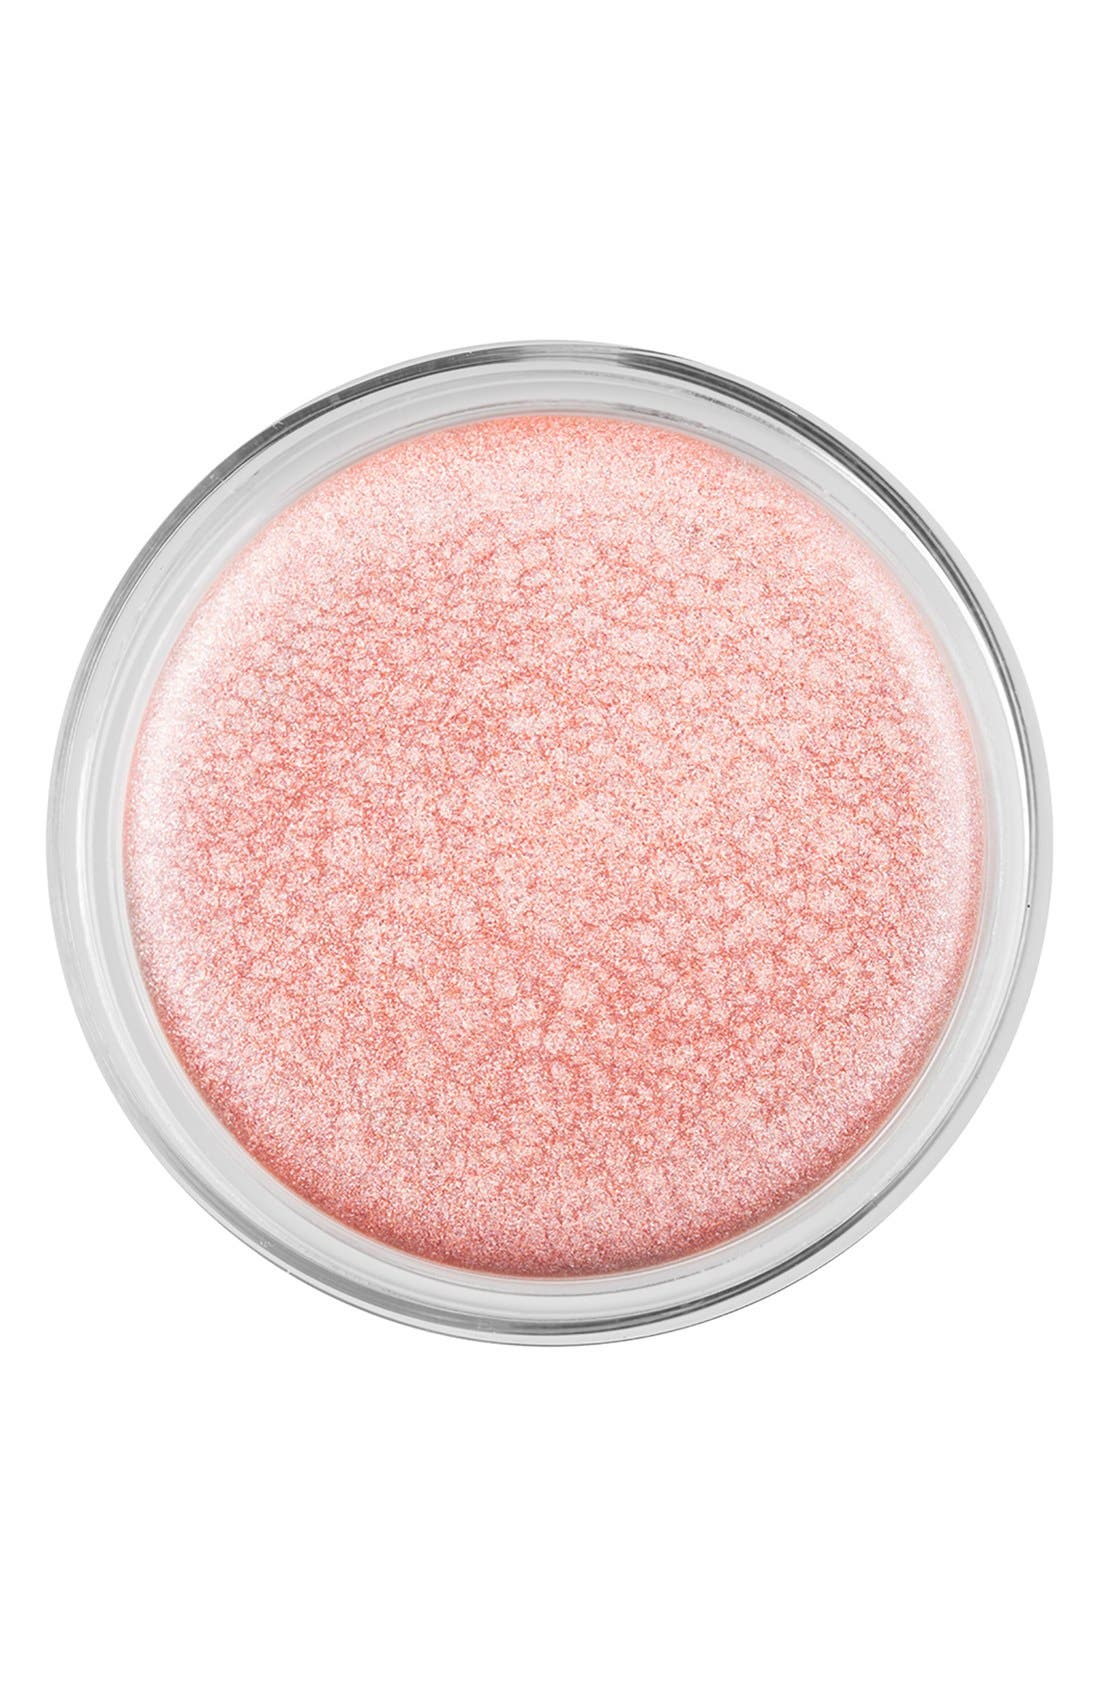 SIGMA BEAUTY Shimmer Cream, Main, color, 650